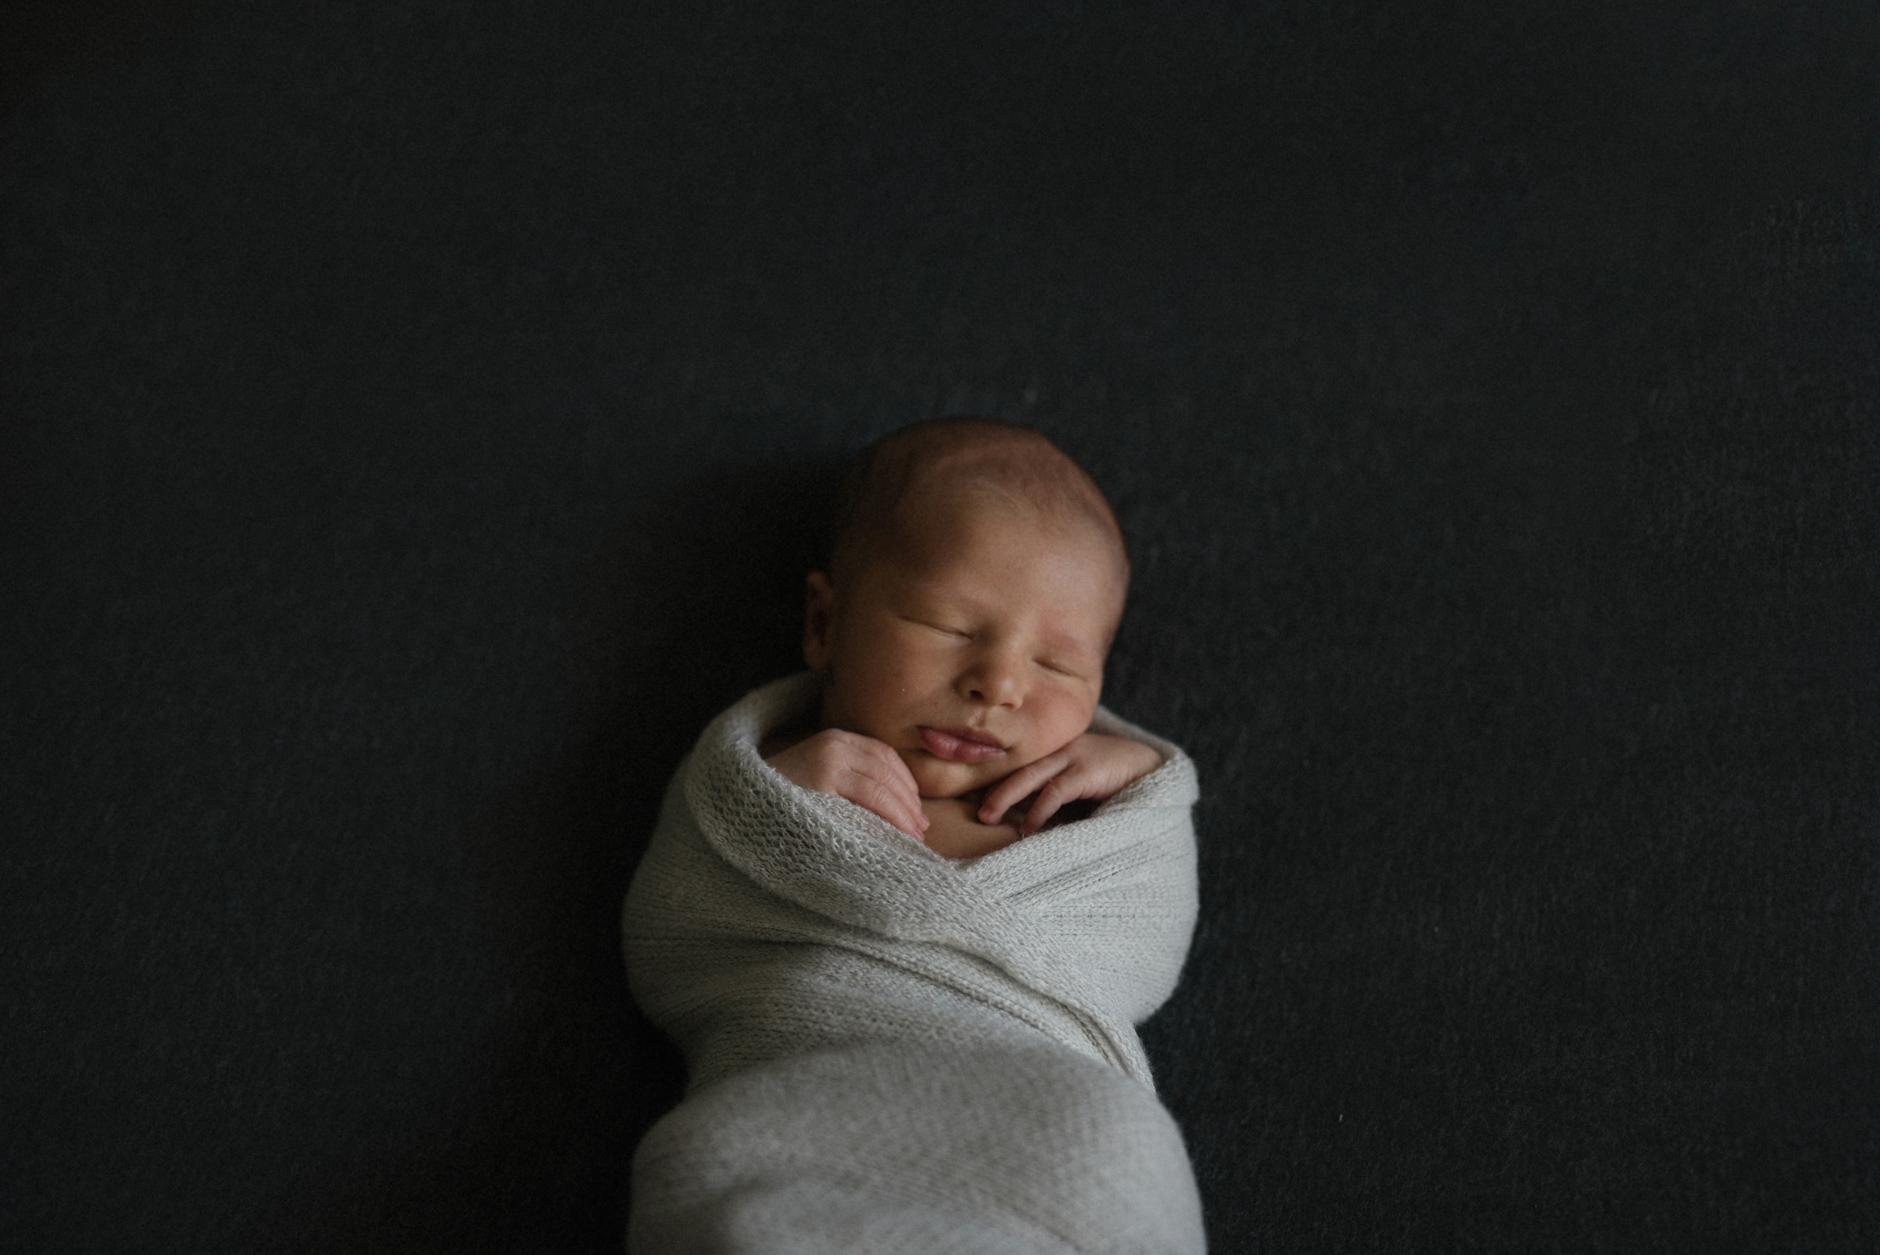 New_Born_Photographer_Glasgow_Nikki_Leadbetter_Photography-25.jpg